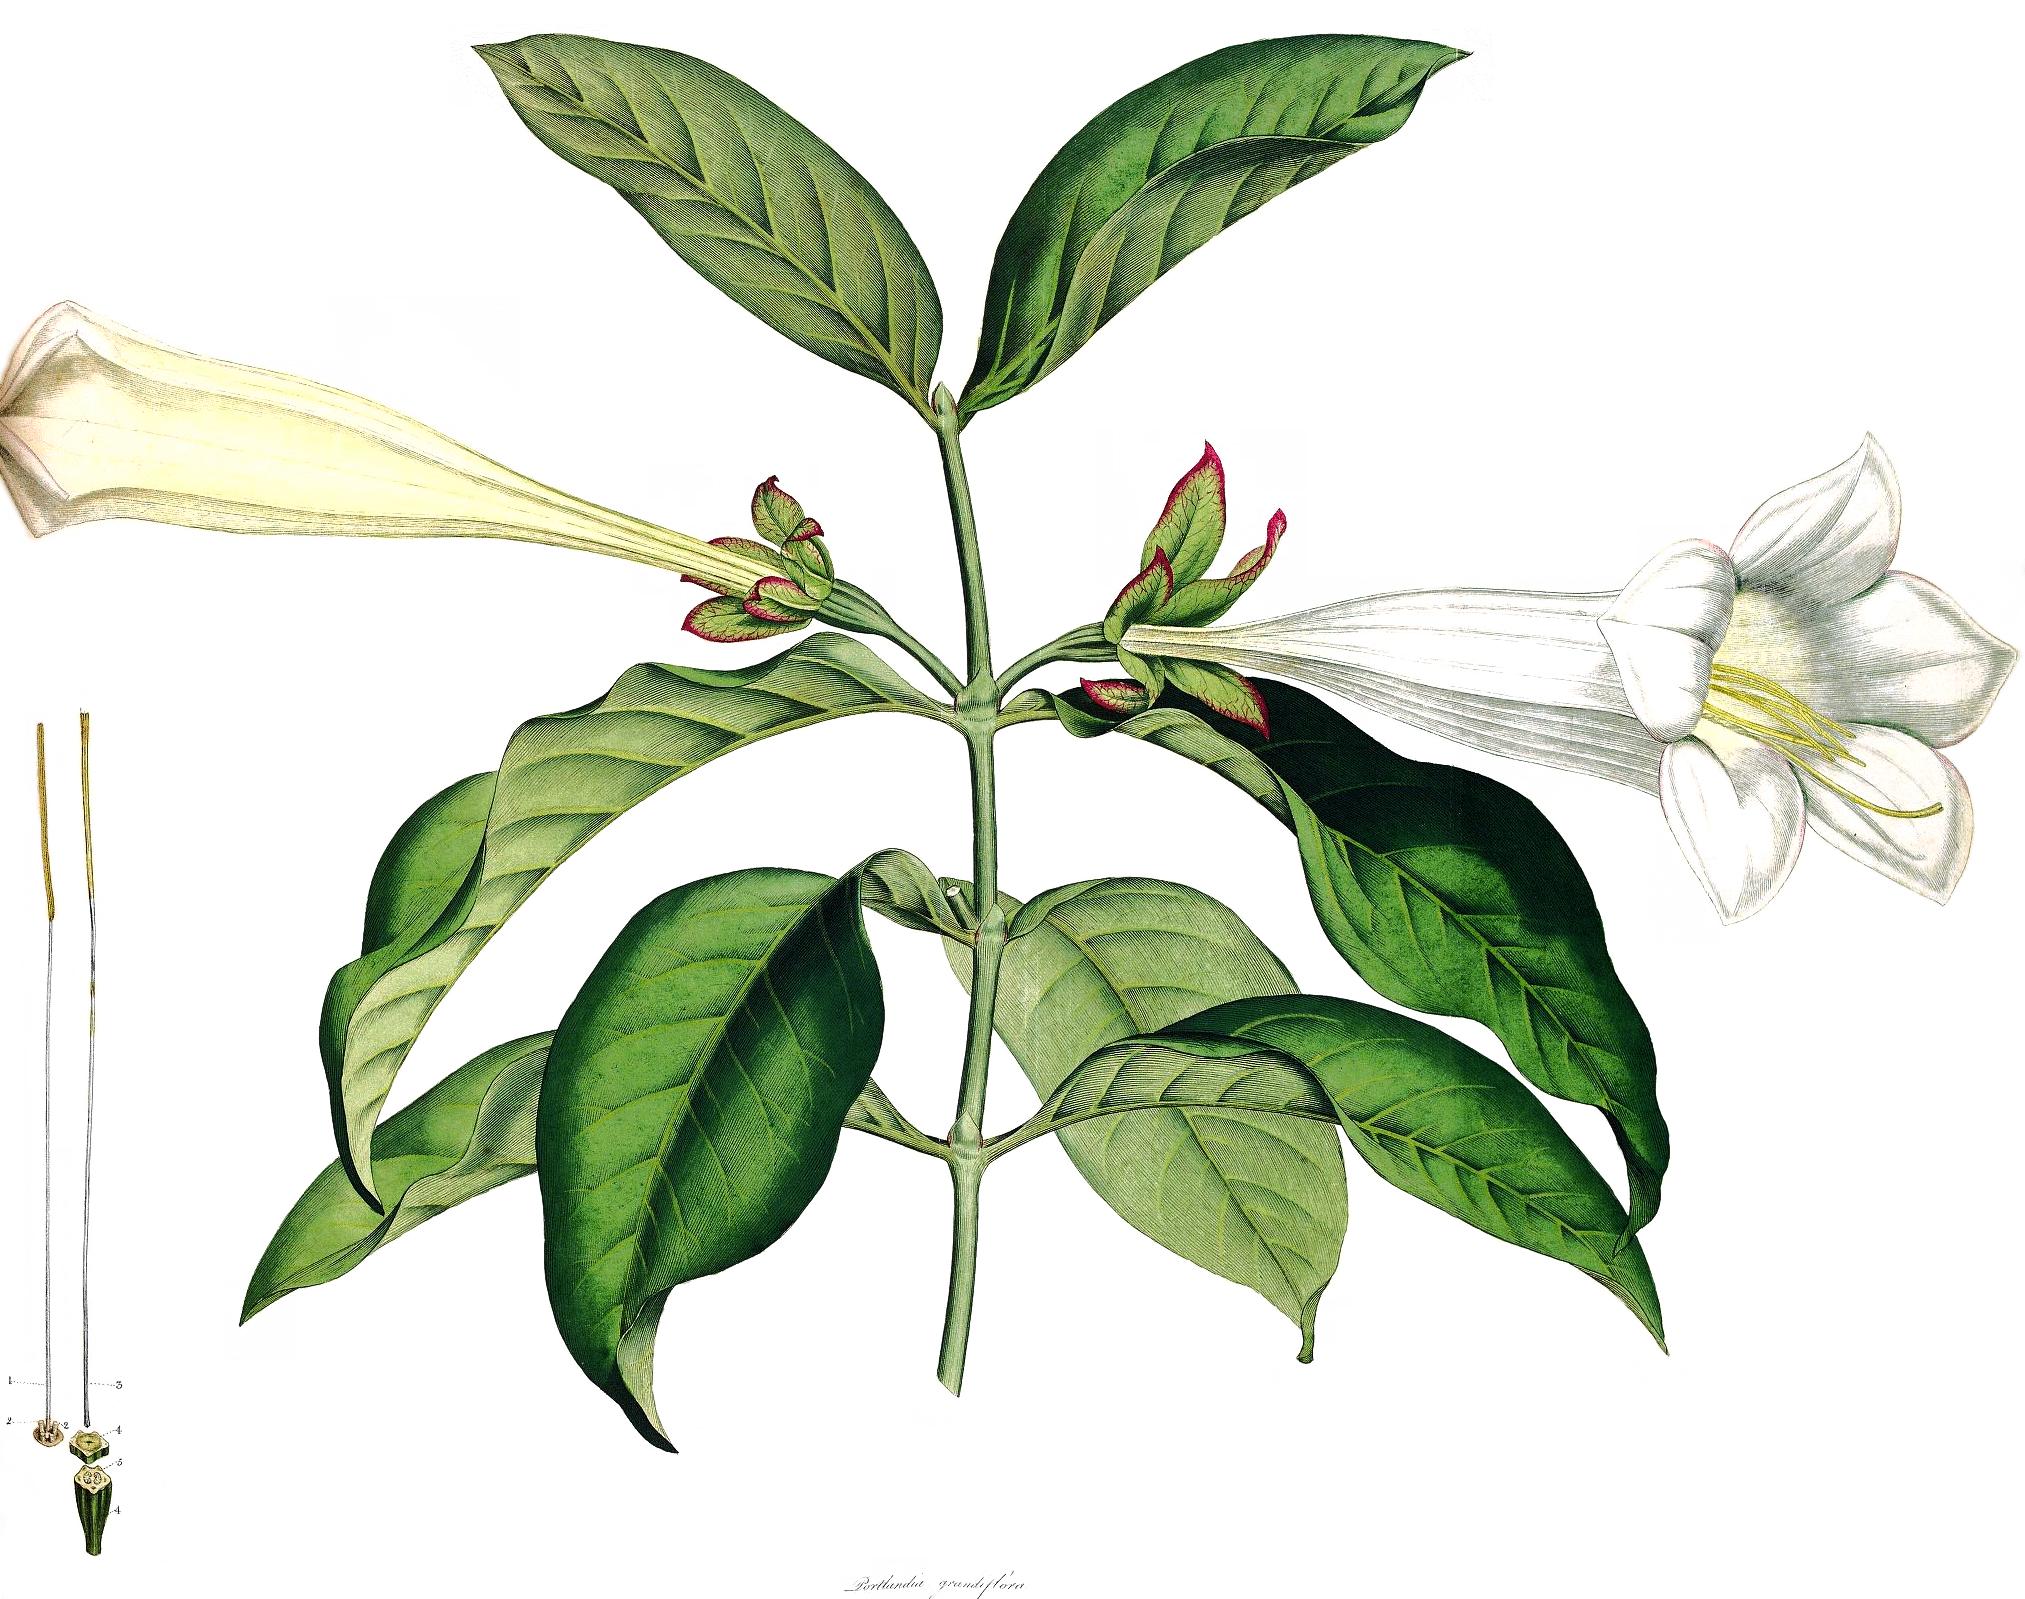 Portlandia grandiflora SmSo.png © James Edward Smith and James Sowerby